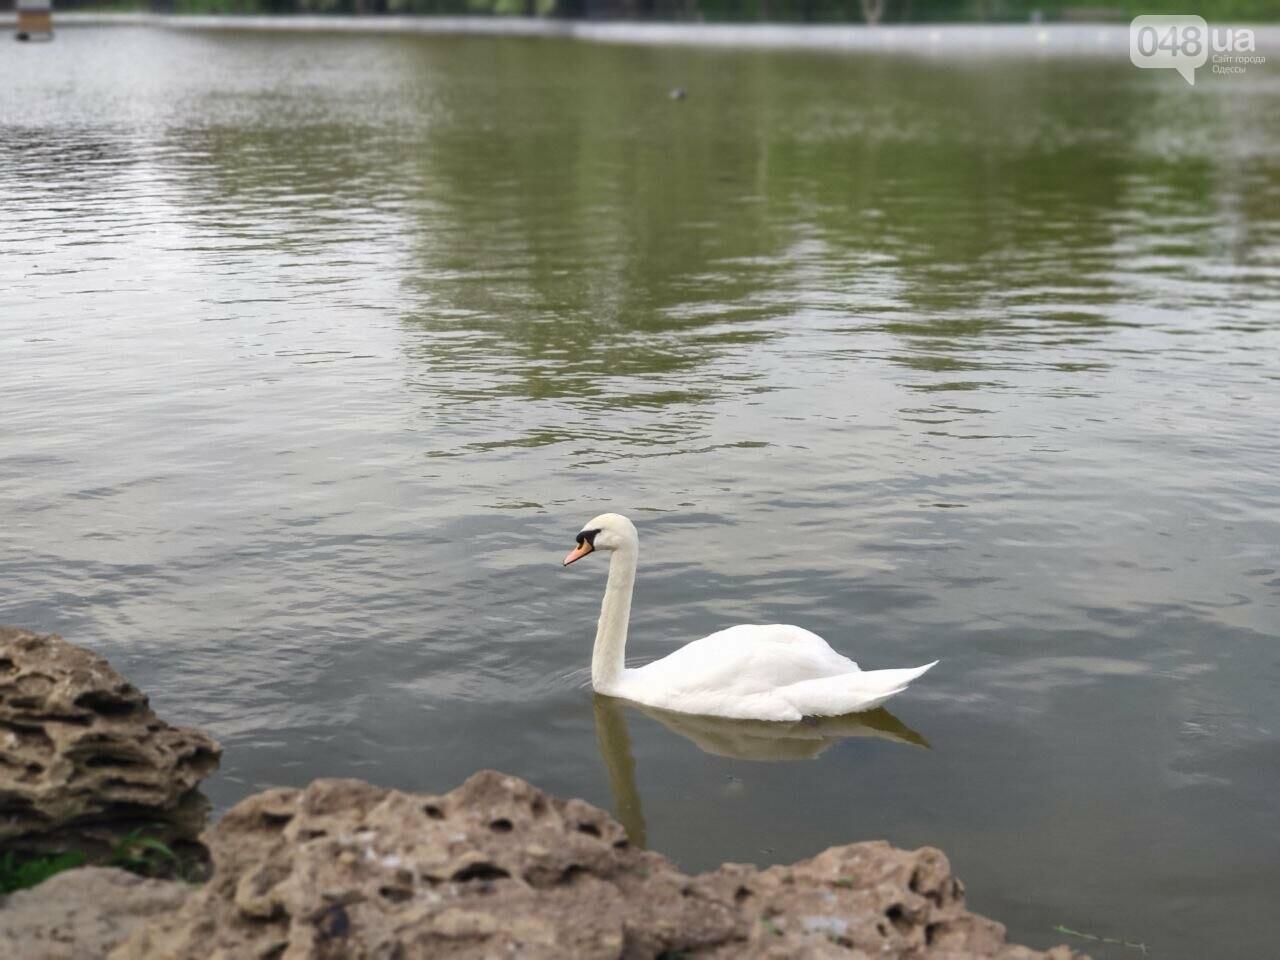 Сакура, лебеди и черепахи: сотни одесситов вышли на прогулку в парк Победы, - ФОТОРЕПОРТАЖ, фото-8